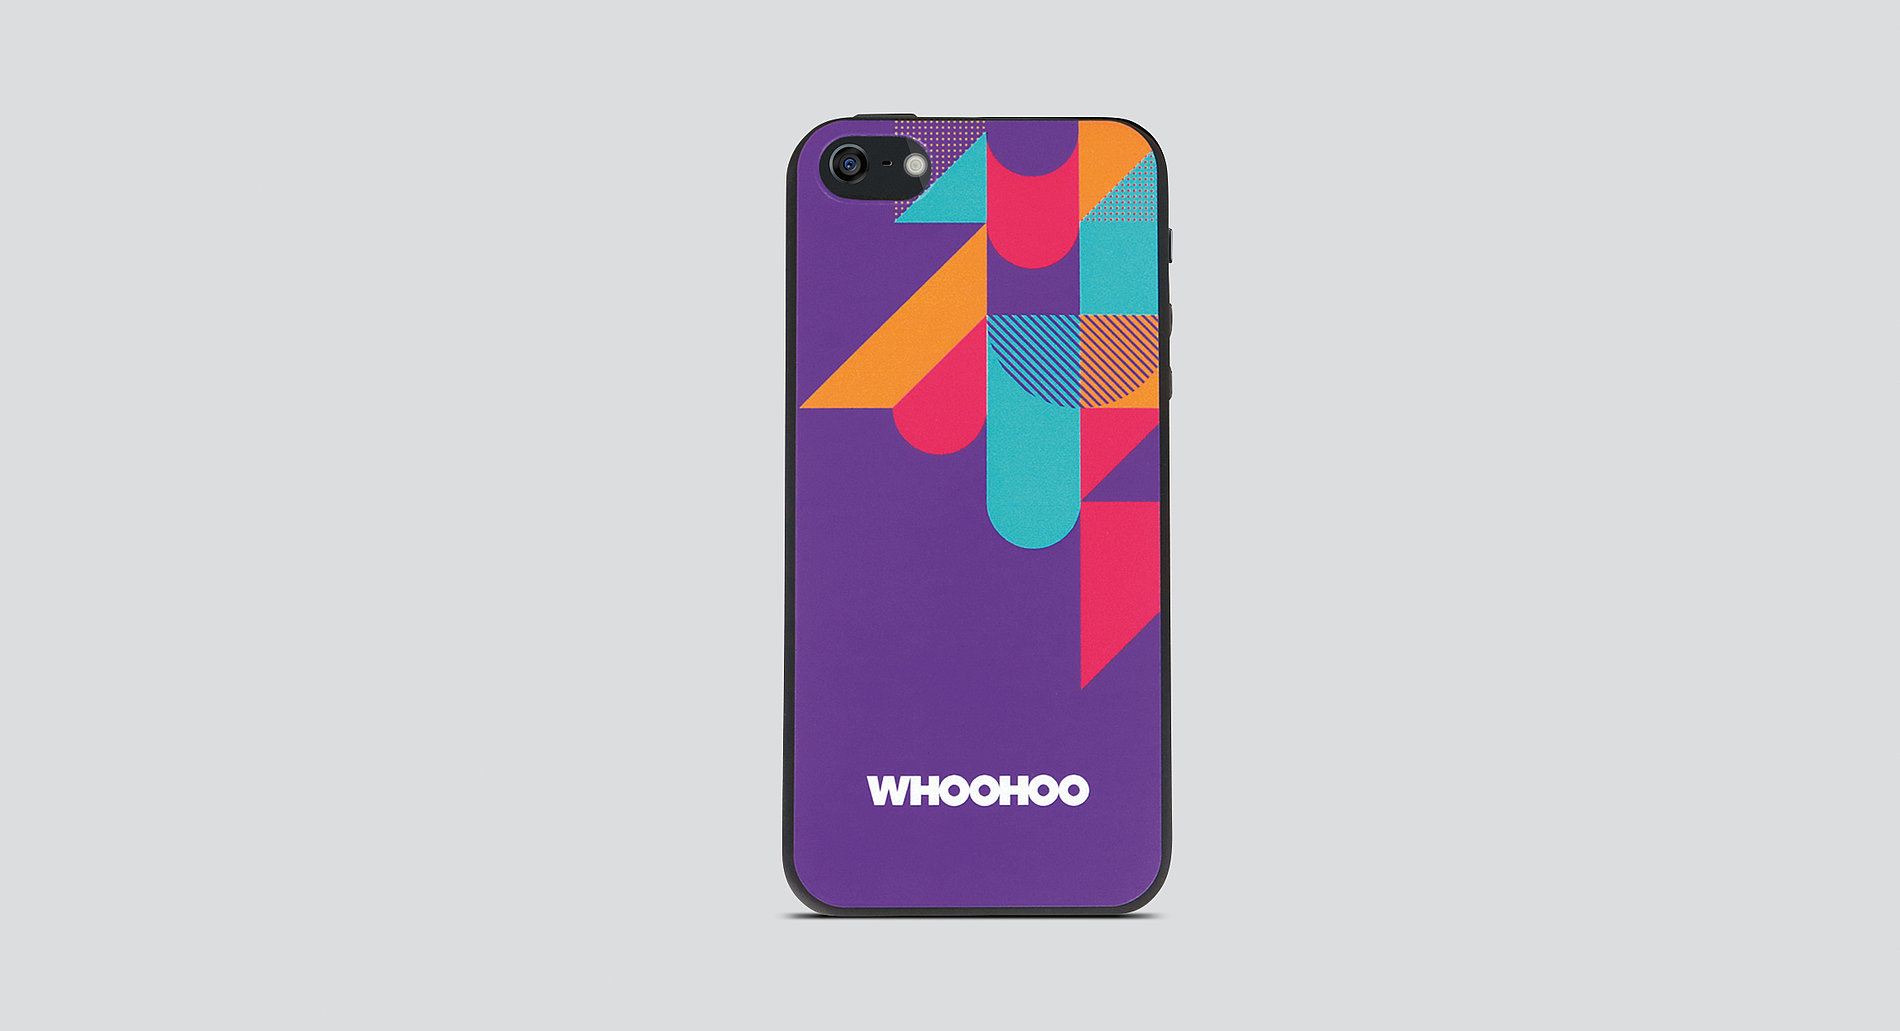 Whoohoo | Red Dot Design Award